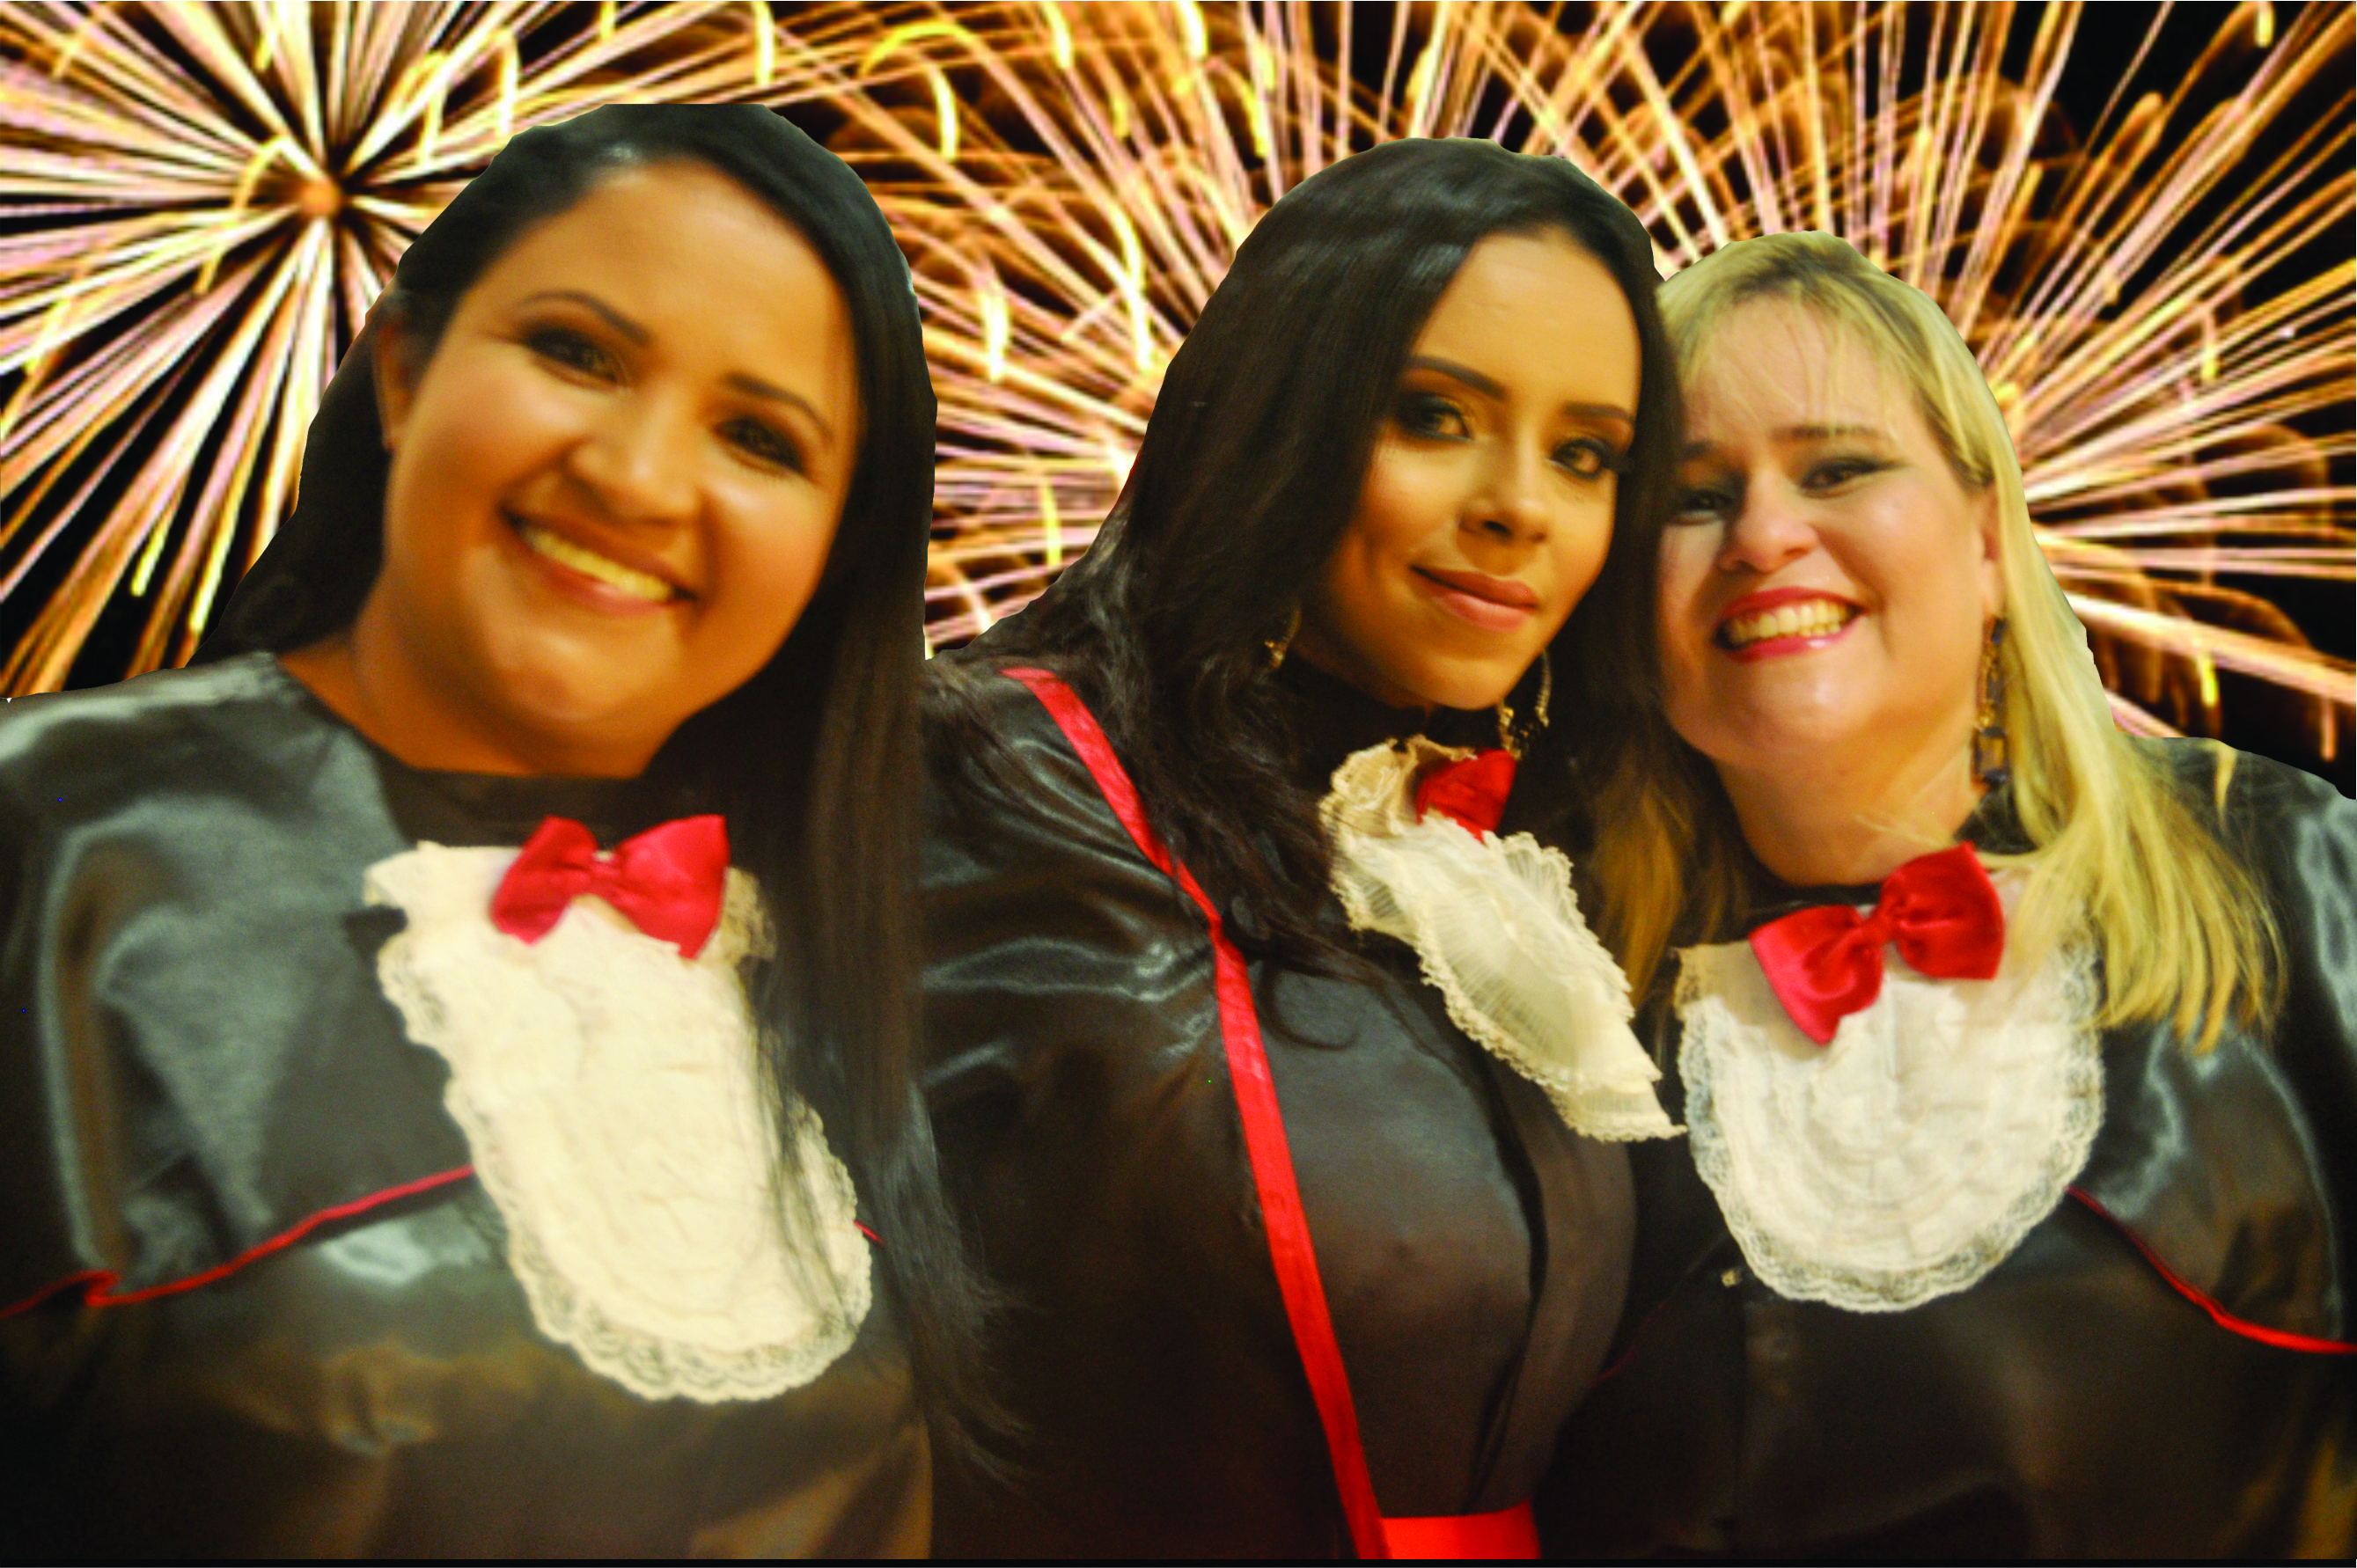 Valdirene, Glauce Camila e Graciele